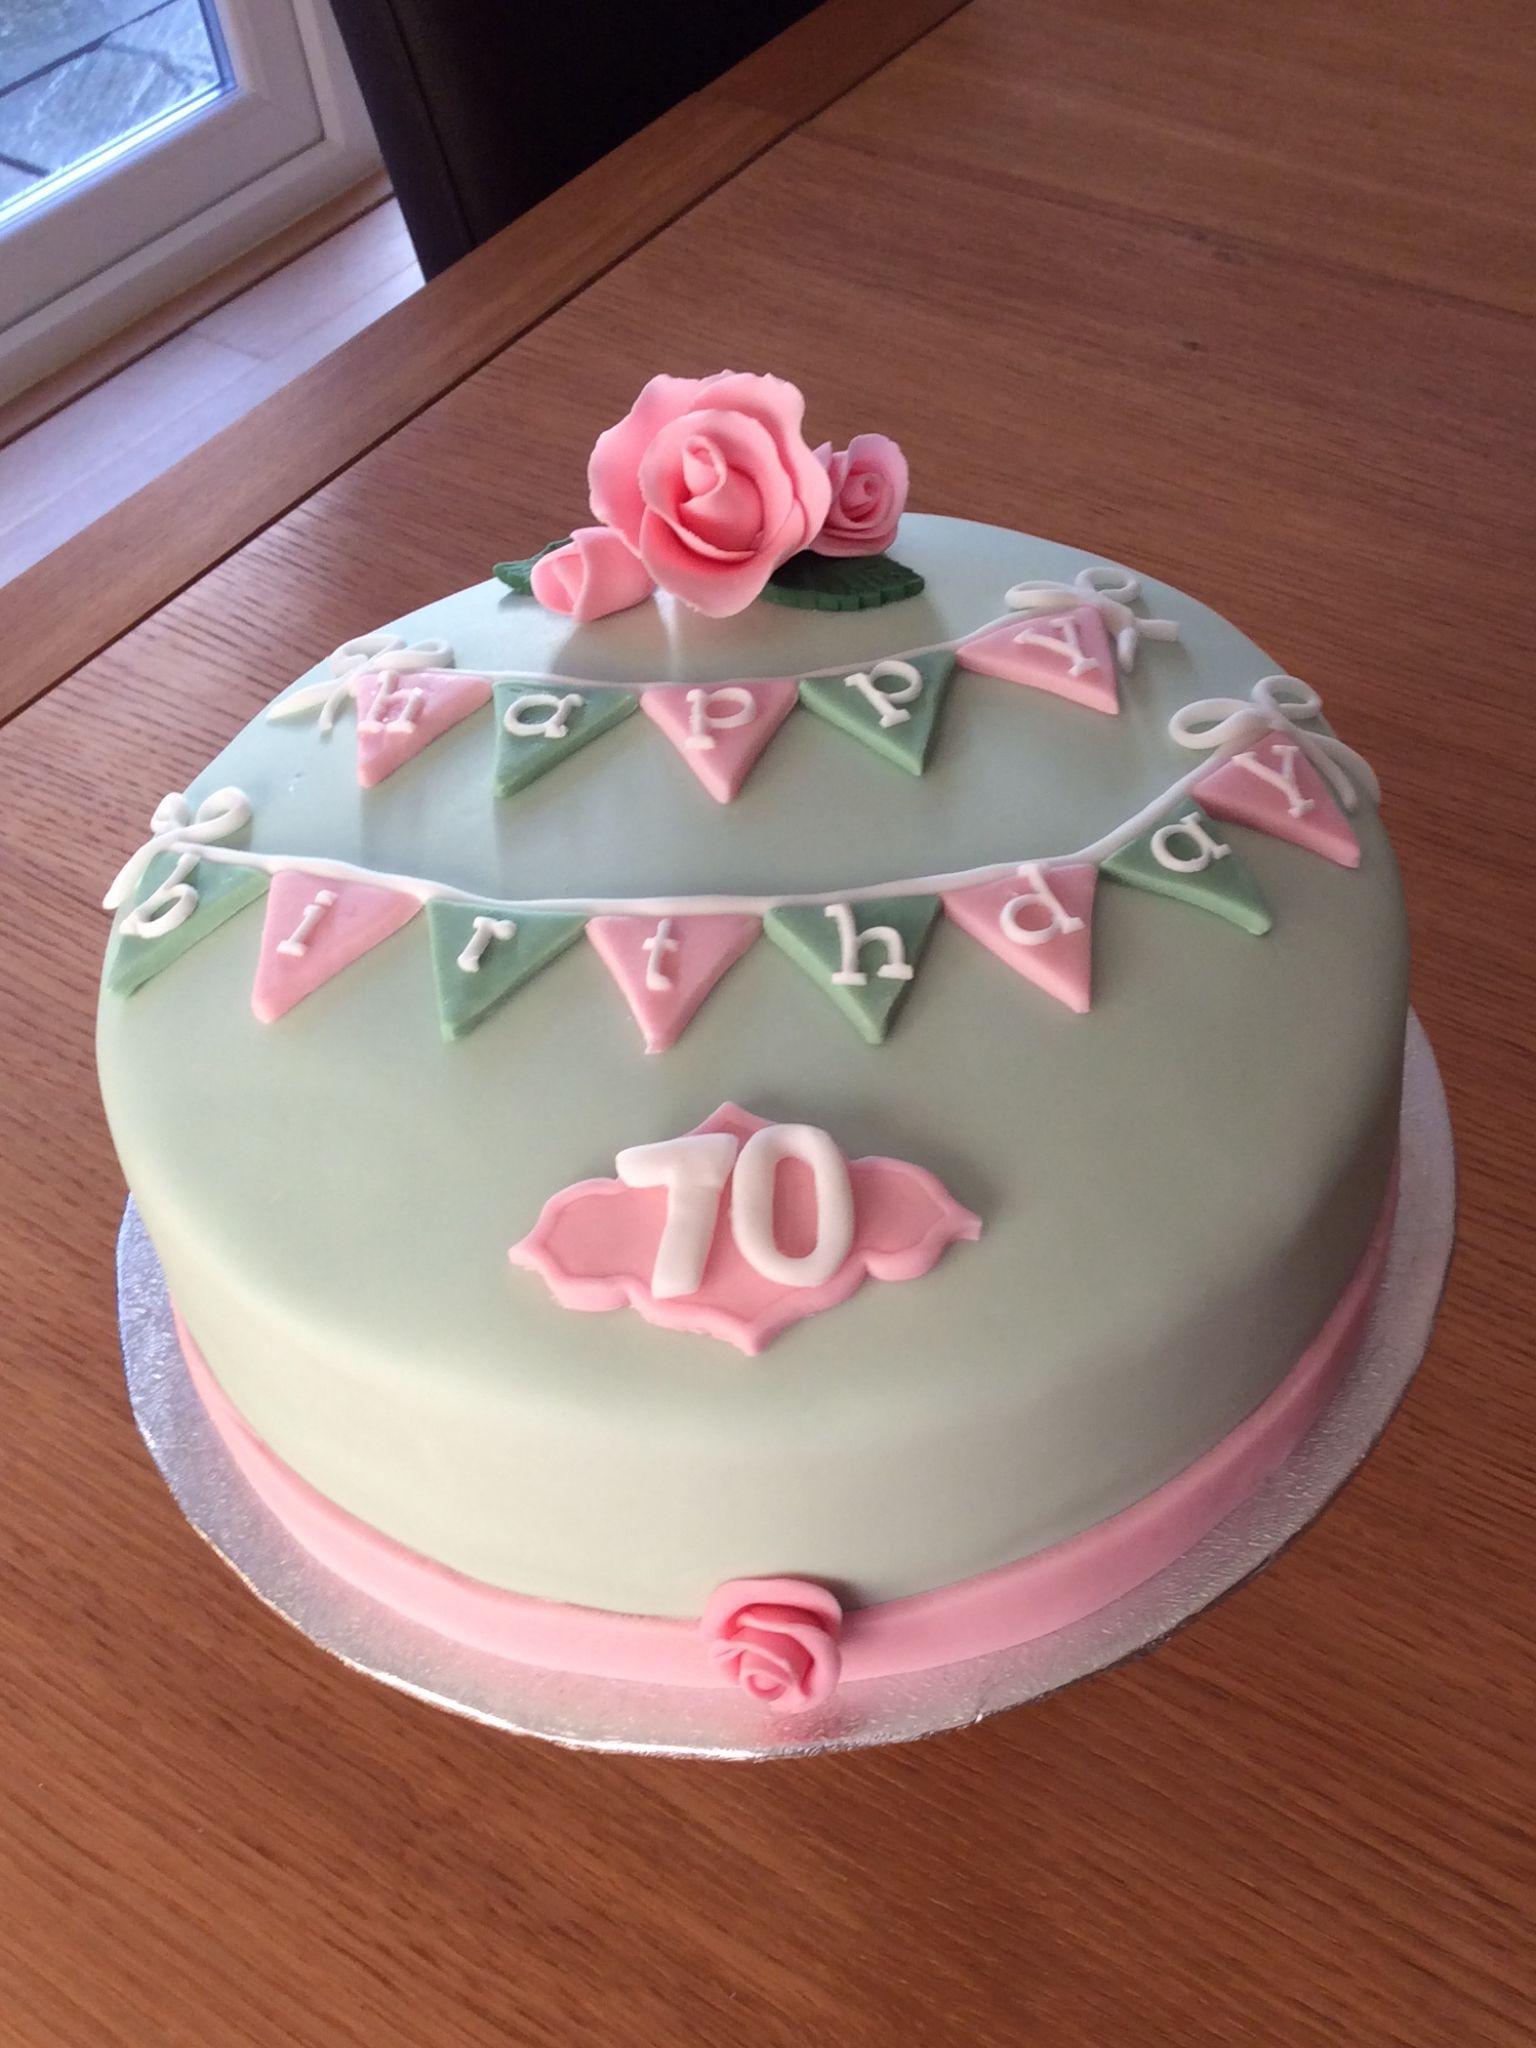 70th Birthday Cake Cakes 70th